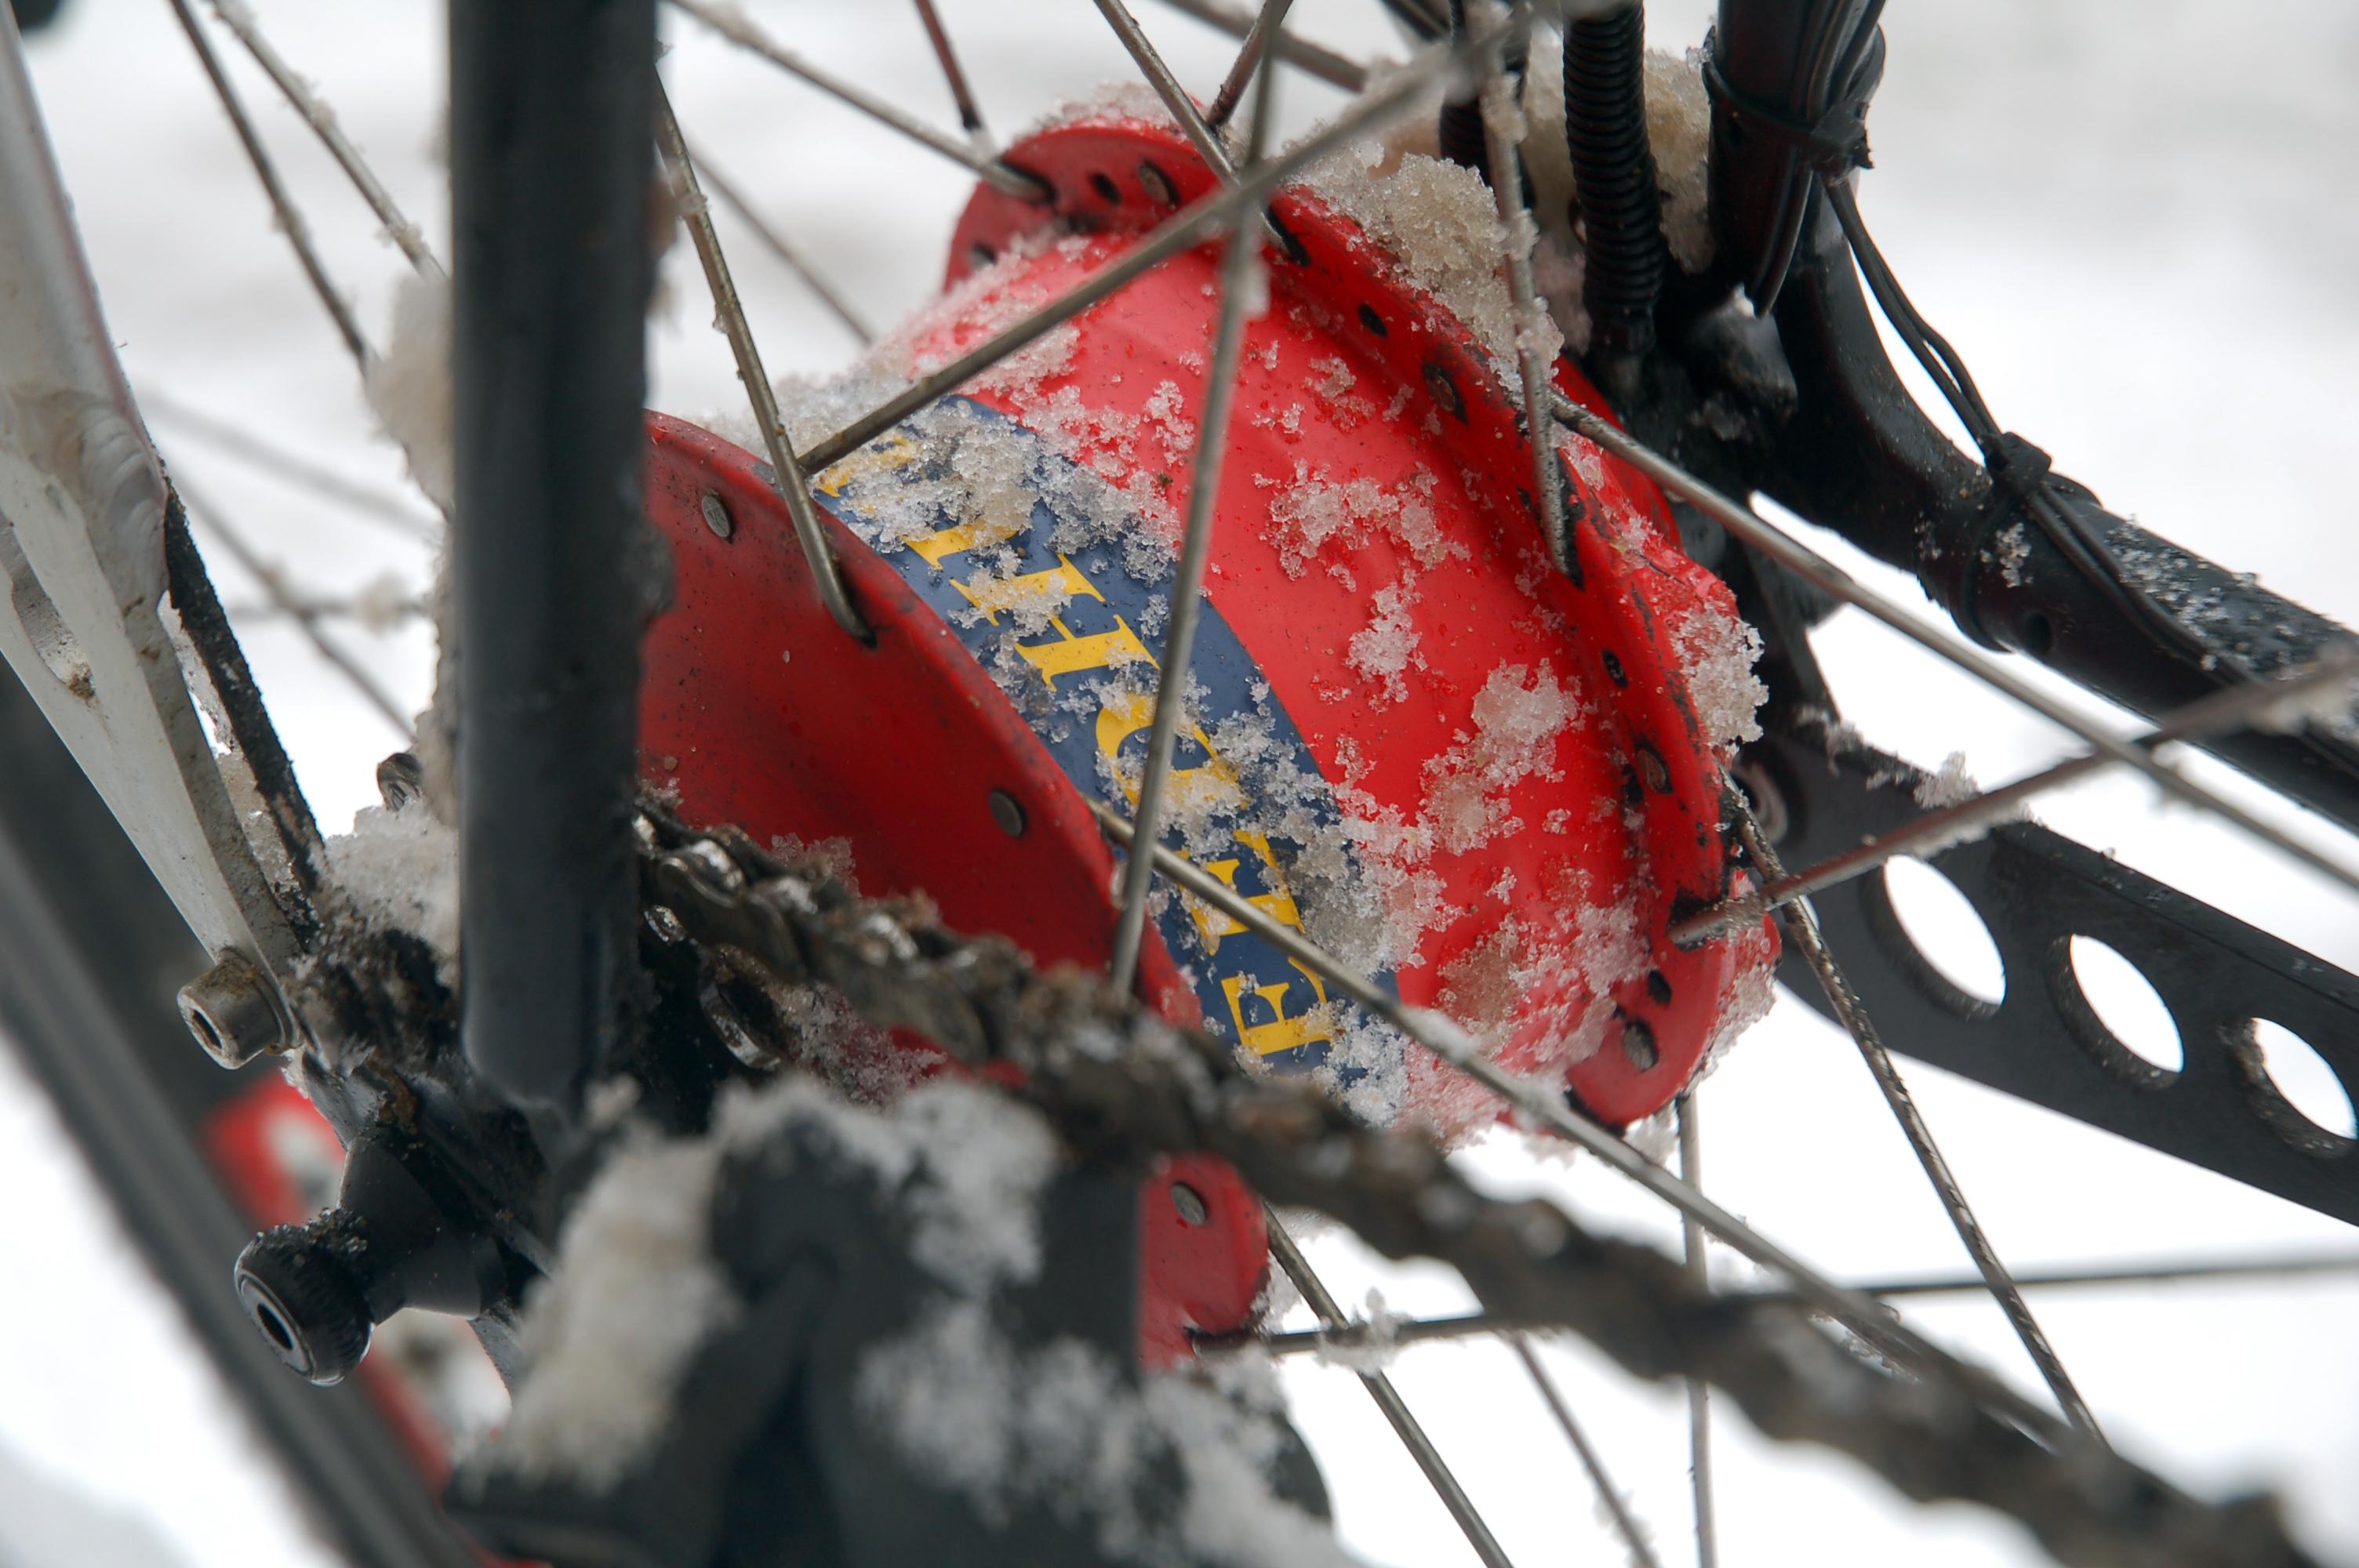 2009-12-31-fahrrad-im-schnee-by-RalfR-4.jpg